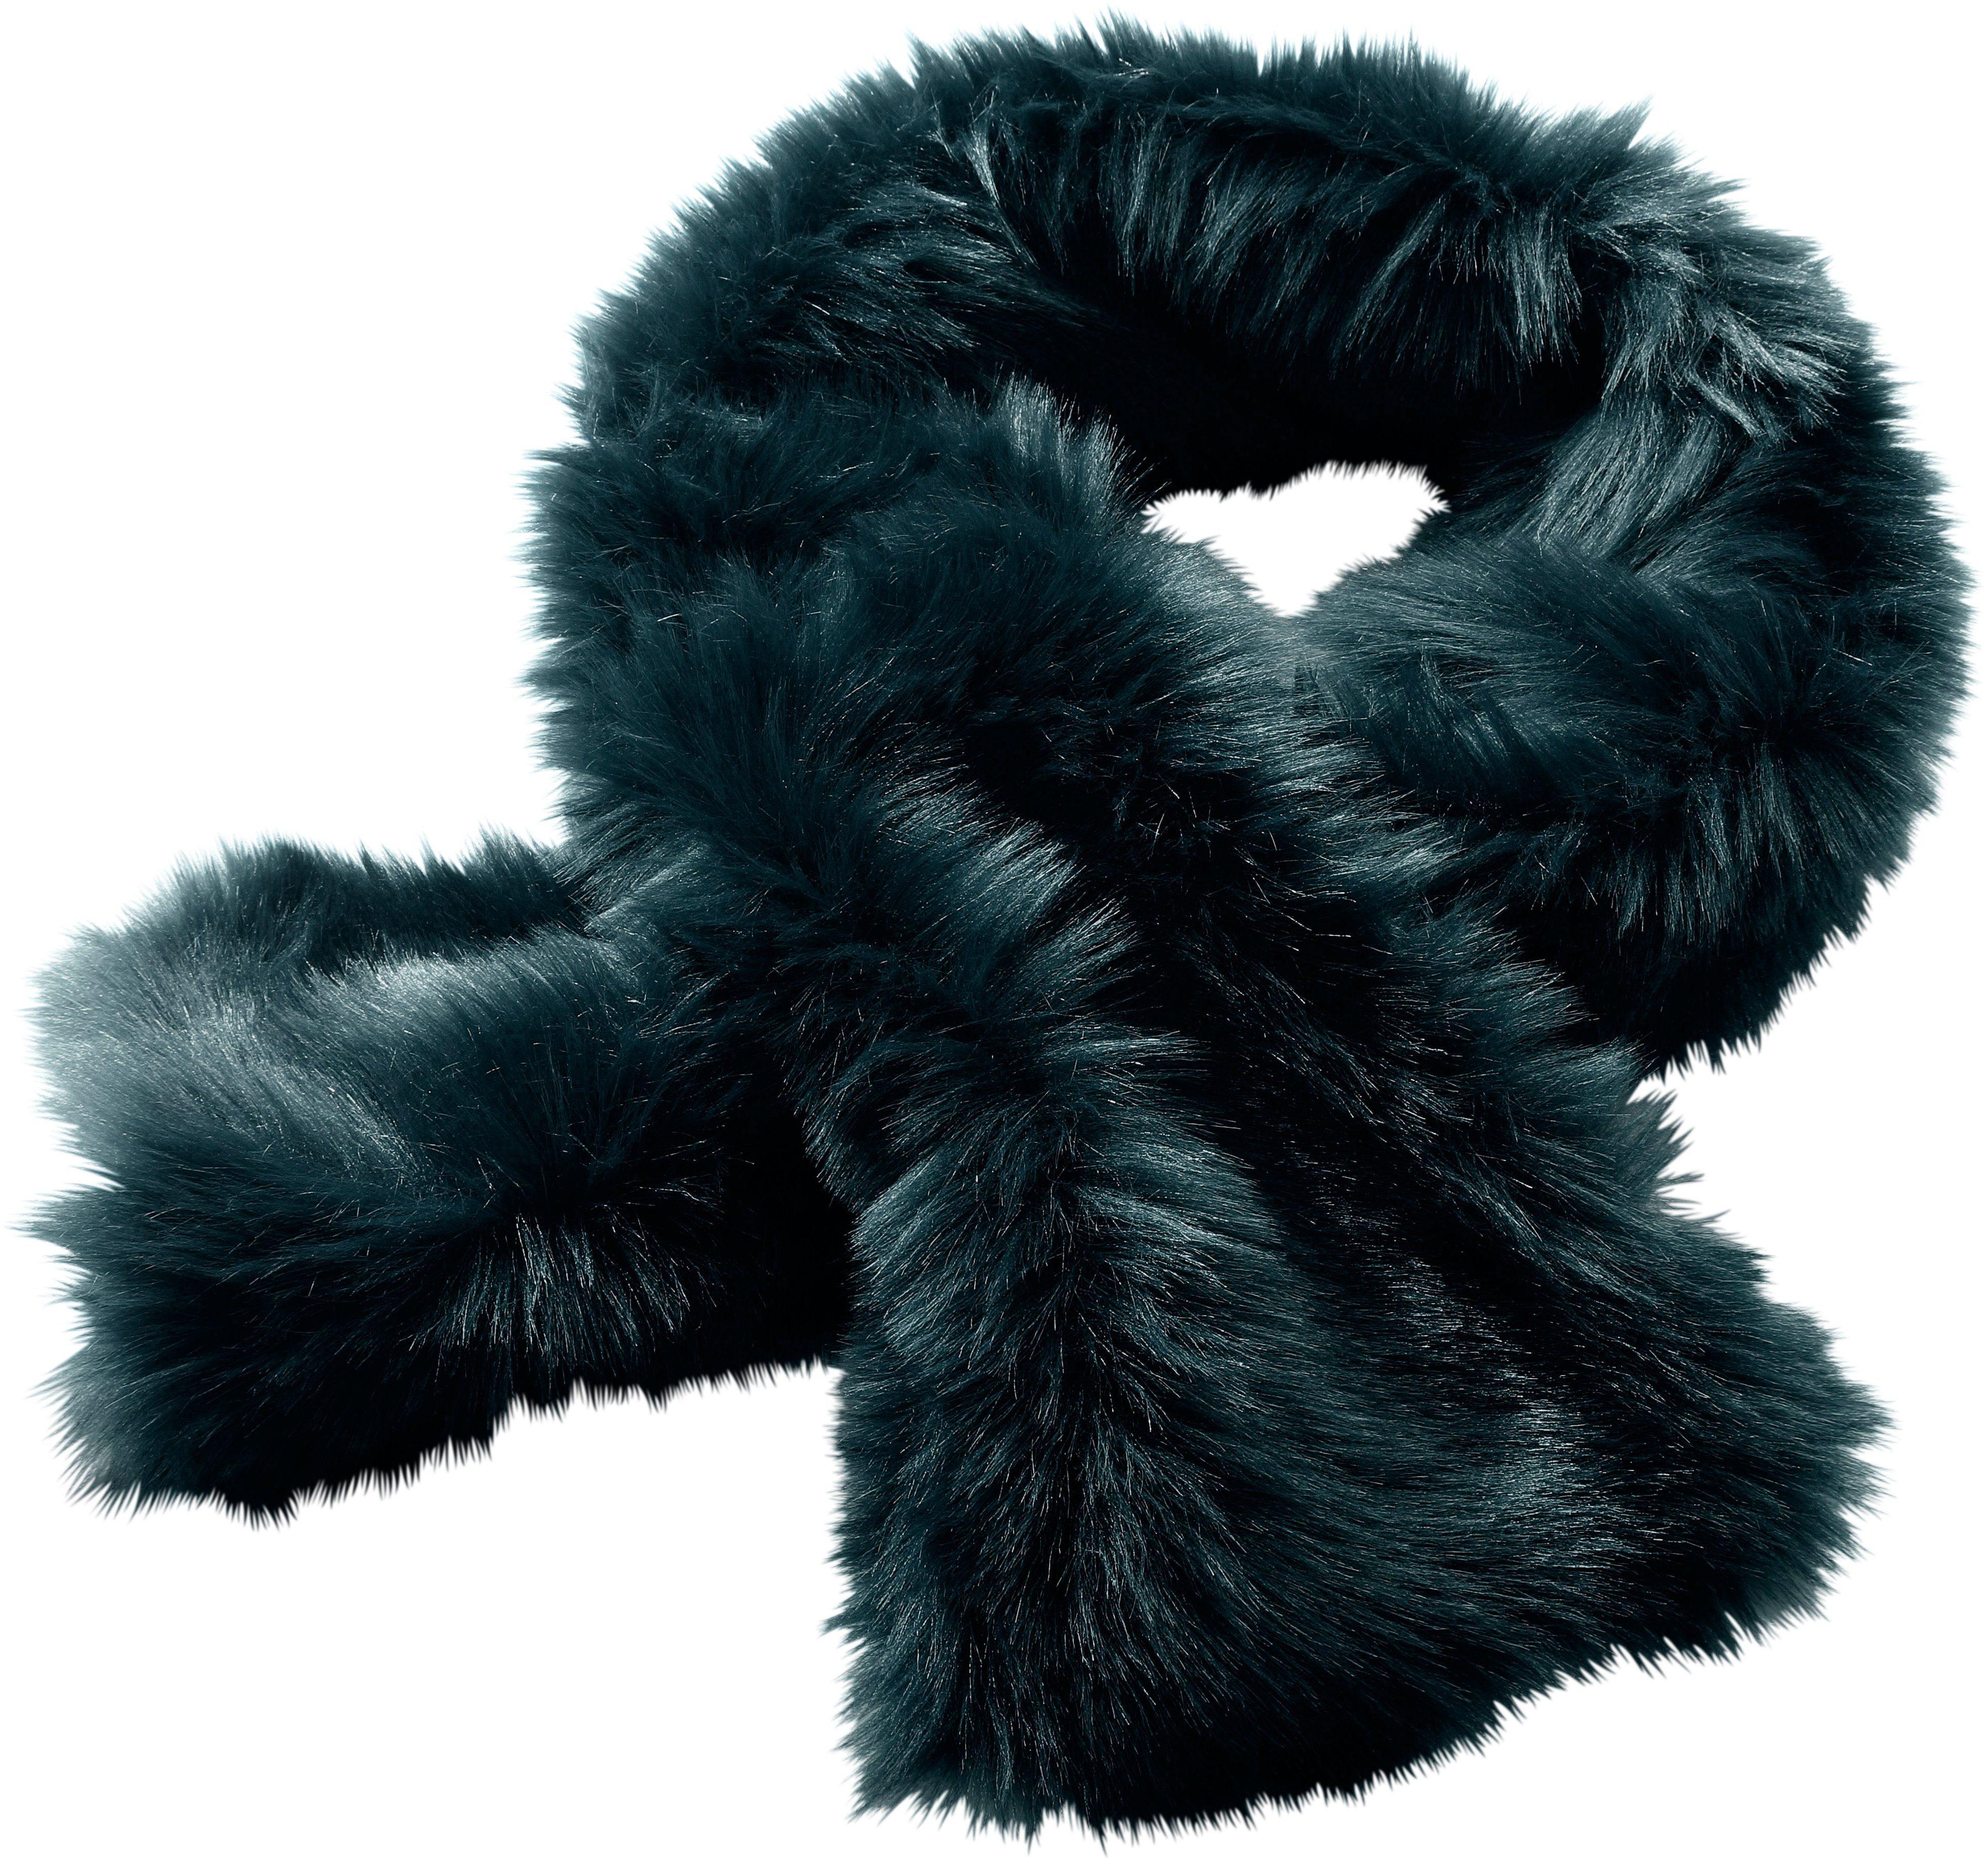 création L Schal in kuscheliger Webpelz-Qualität